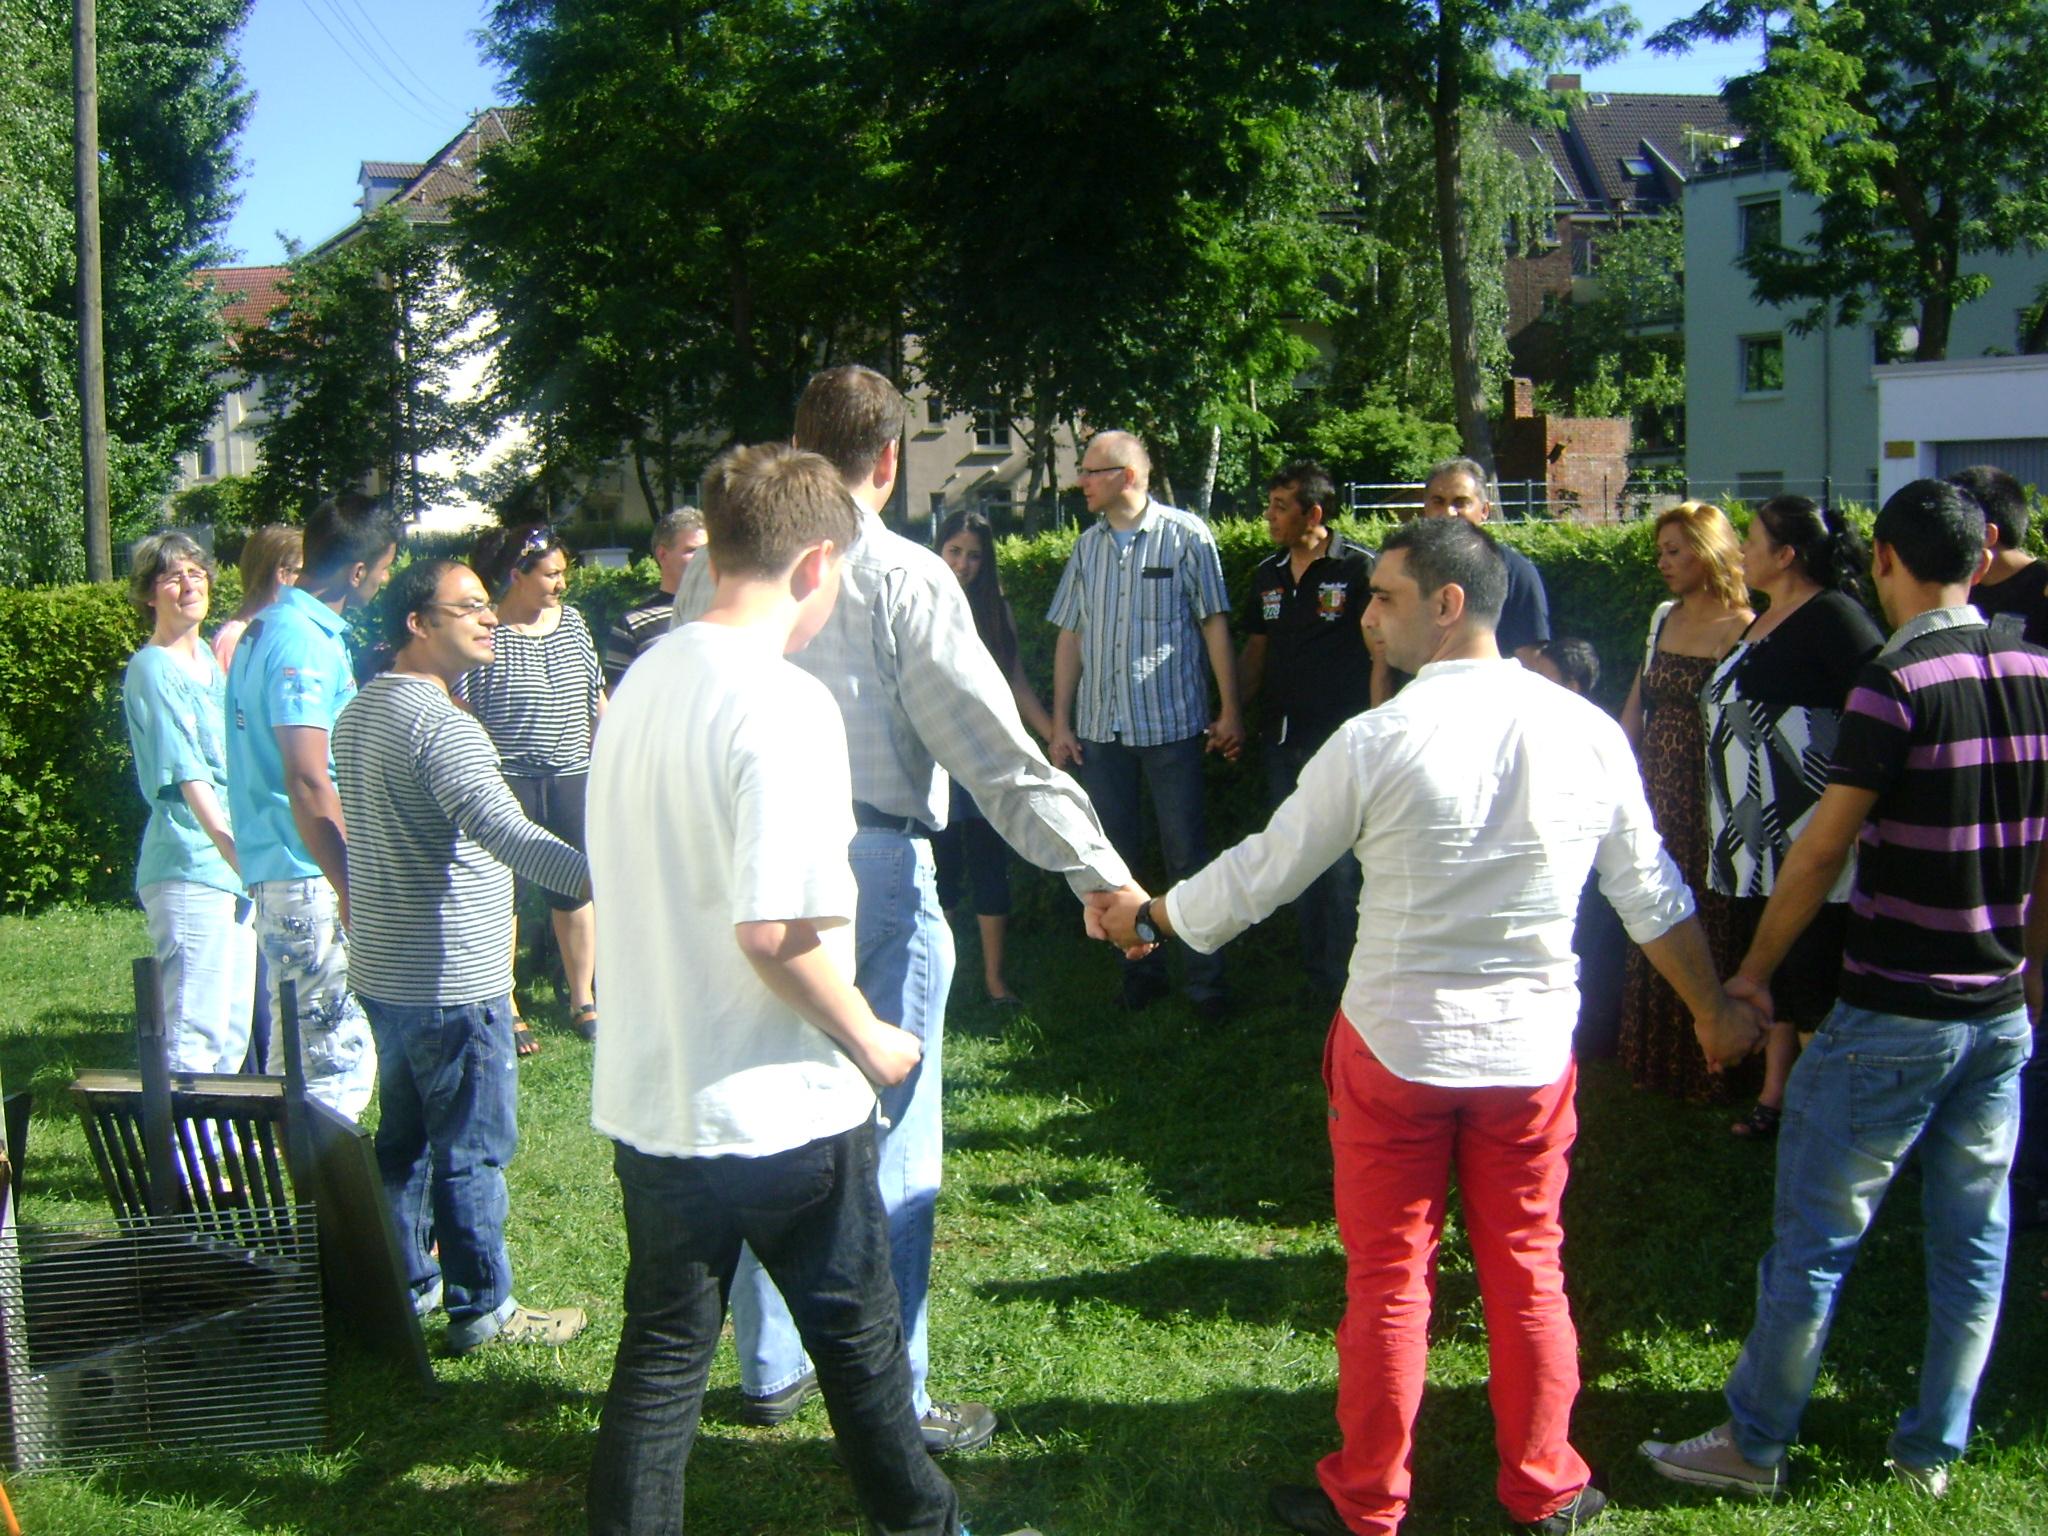 201306130-AzizAfize-Bilder-Offenbach_237